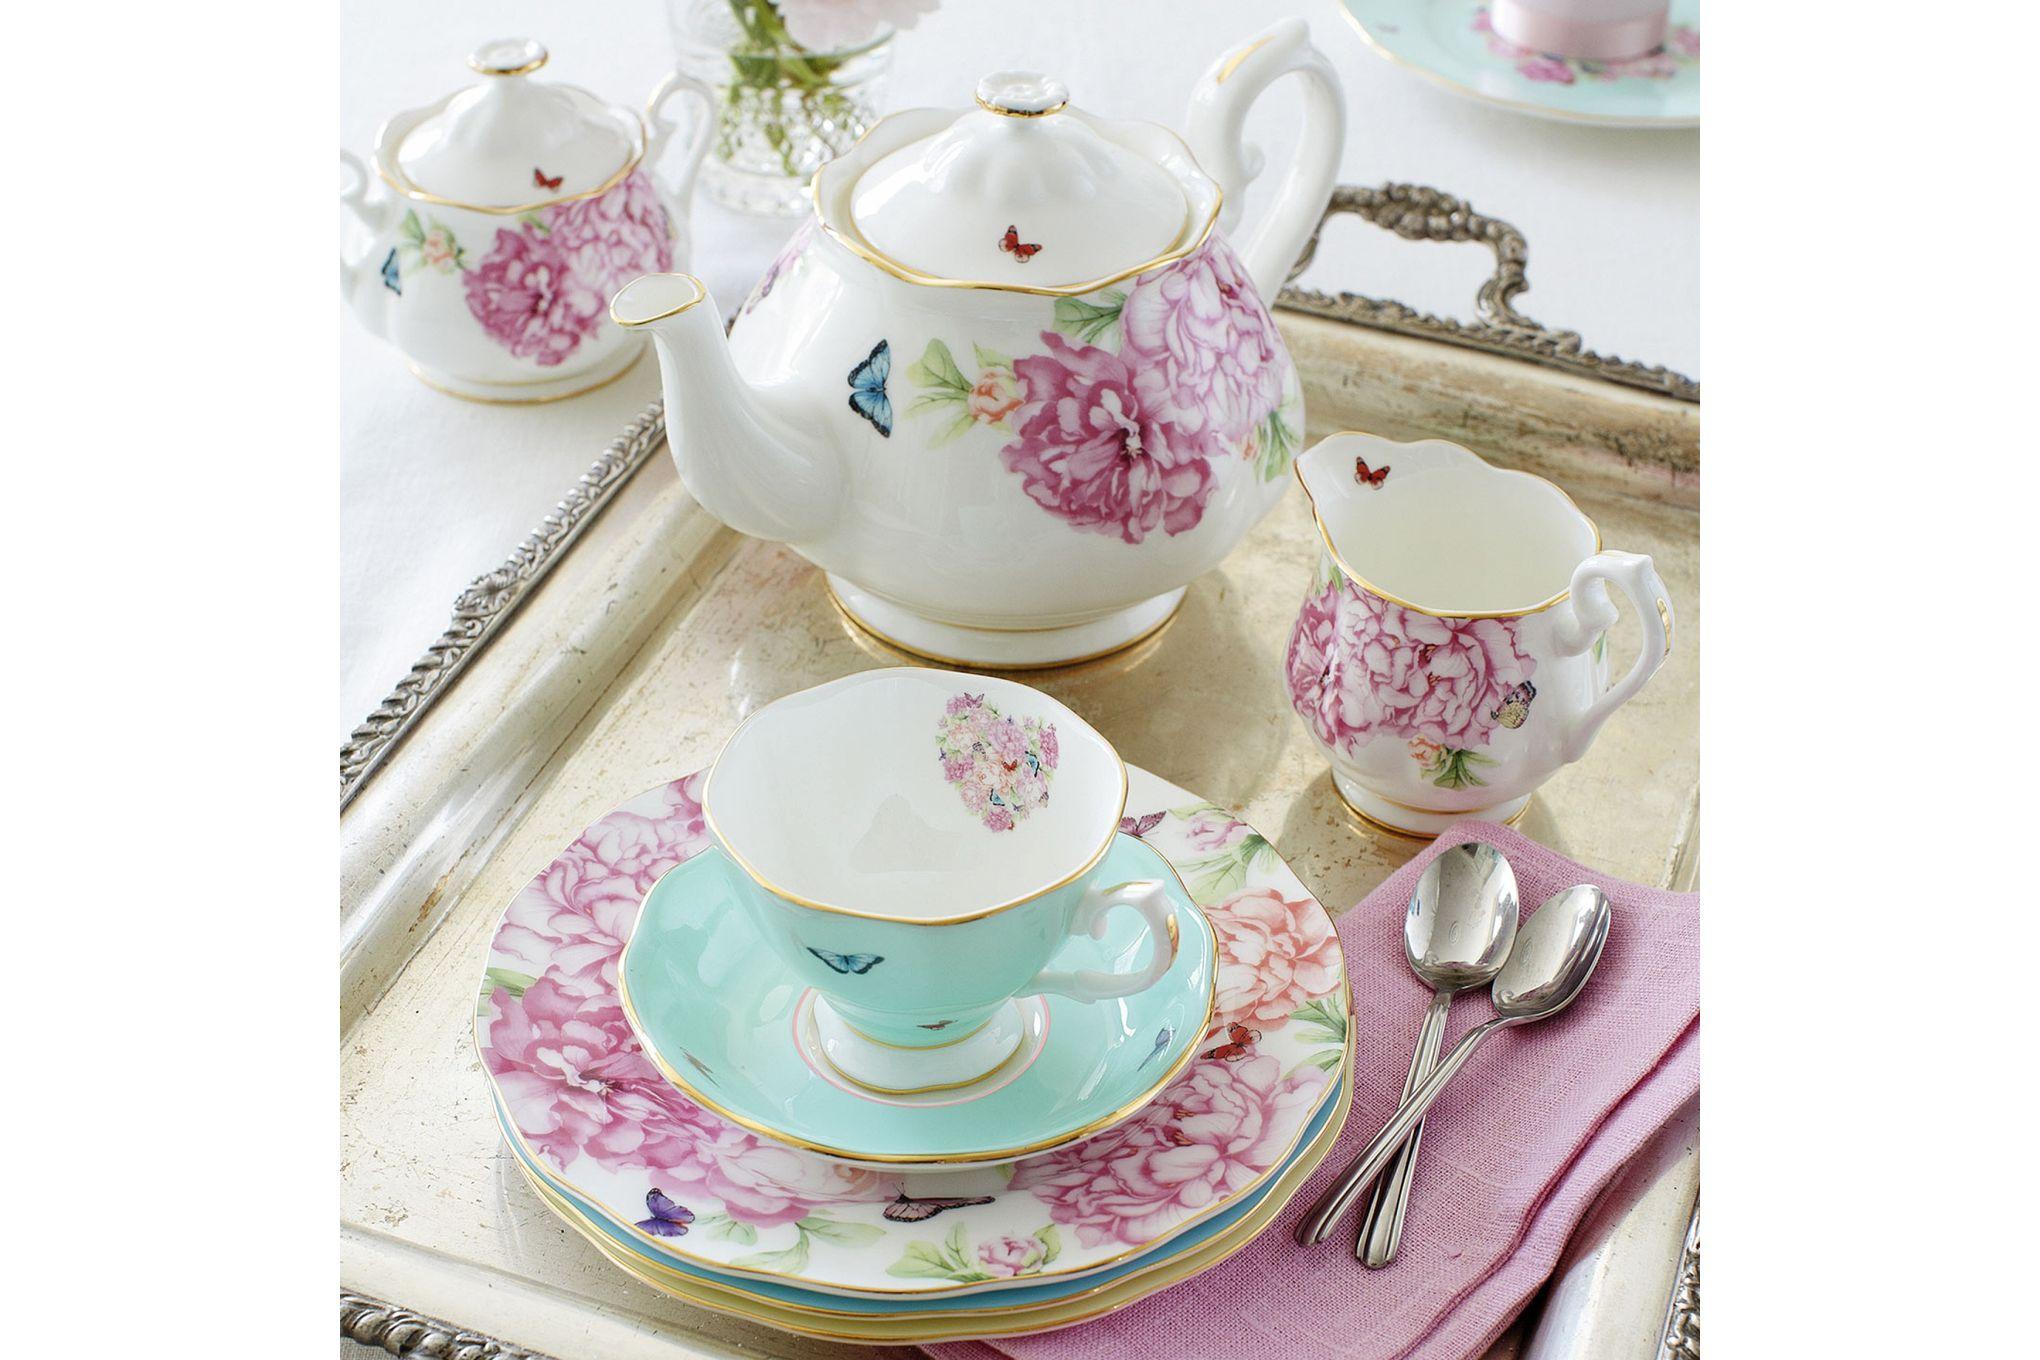 Miranda Kerr for Royal Albert Friendship 3 Piece Tea set Teapot, Sugar and Cream thumb 4